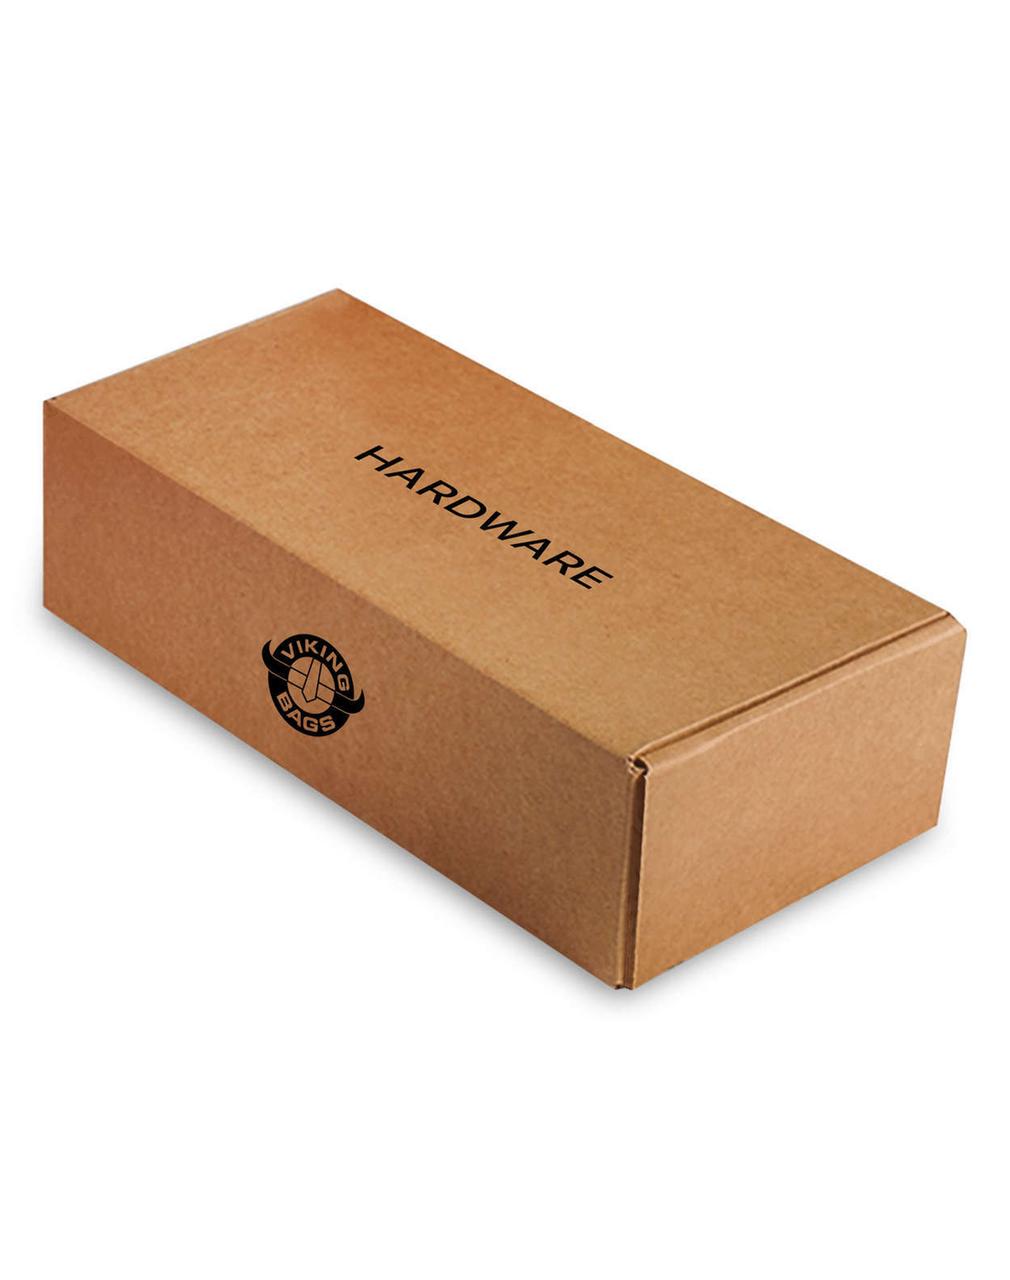 Triumph Thunderbird SS Slanted Medium Motorcycle Saddlebags Box